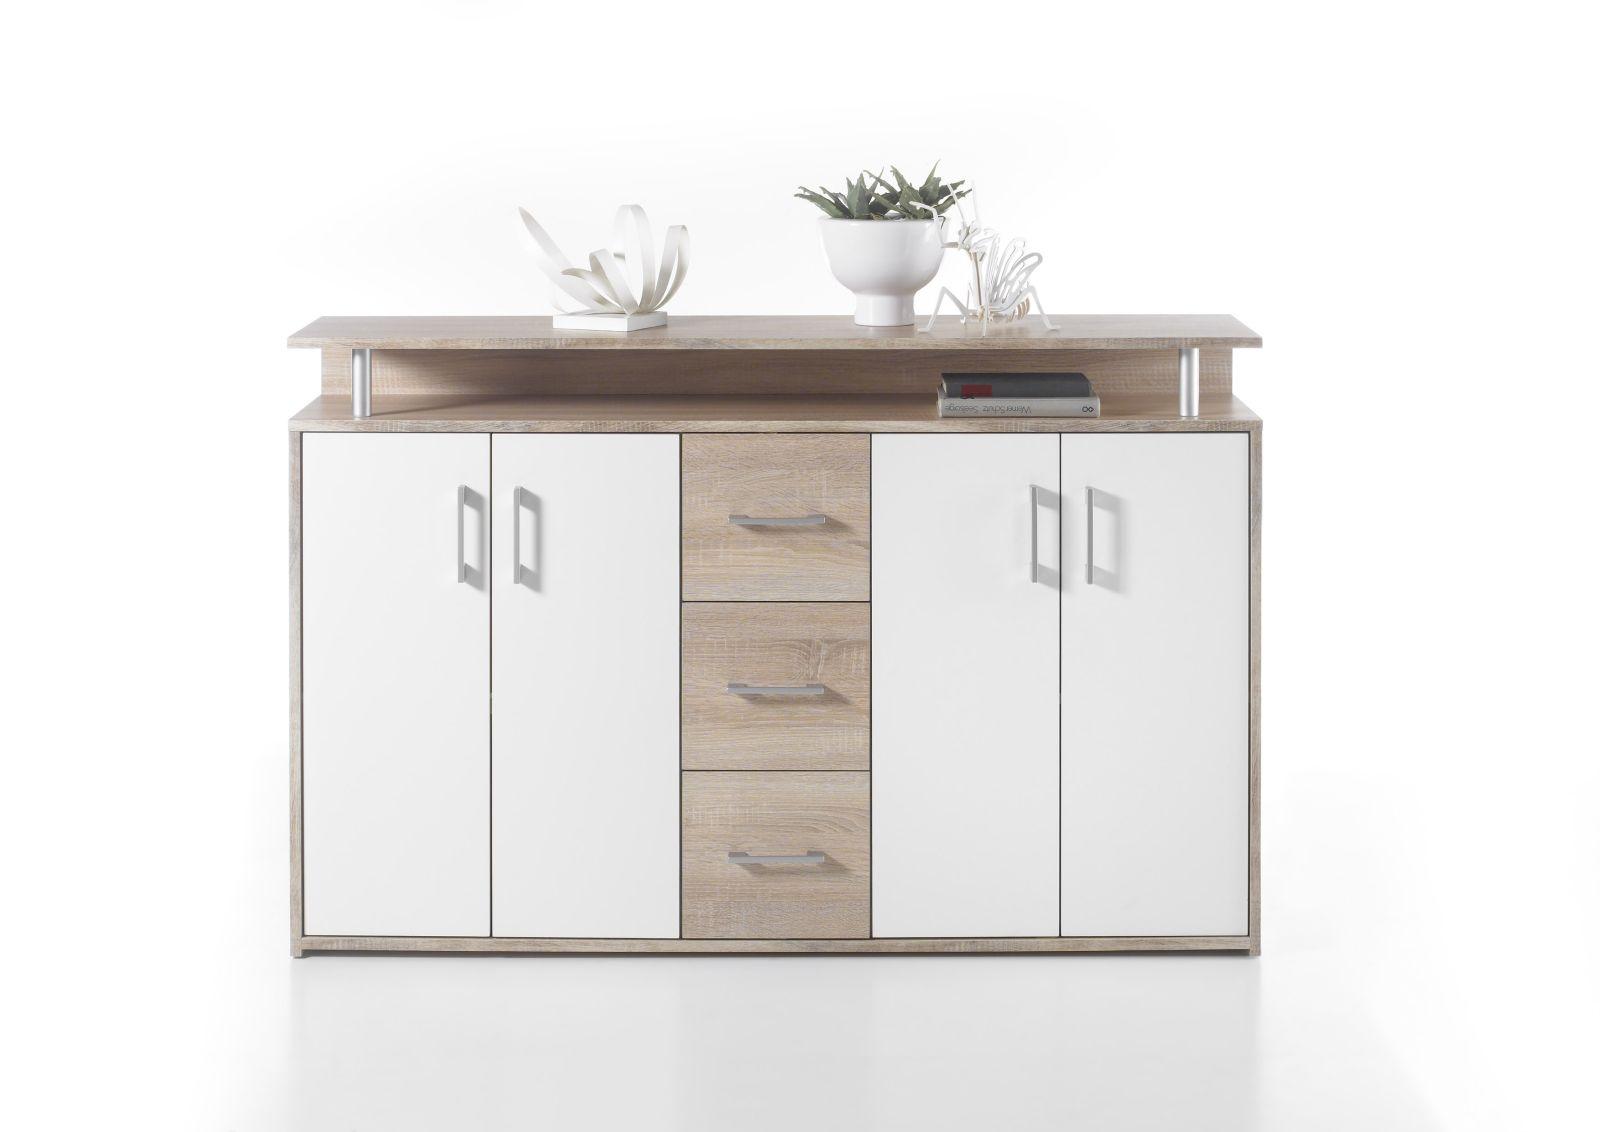 highboard drift wohnprogramme wohnzimmer sortiment. Black Bedroom Furniture Sets. Home Design Ideas